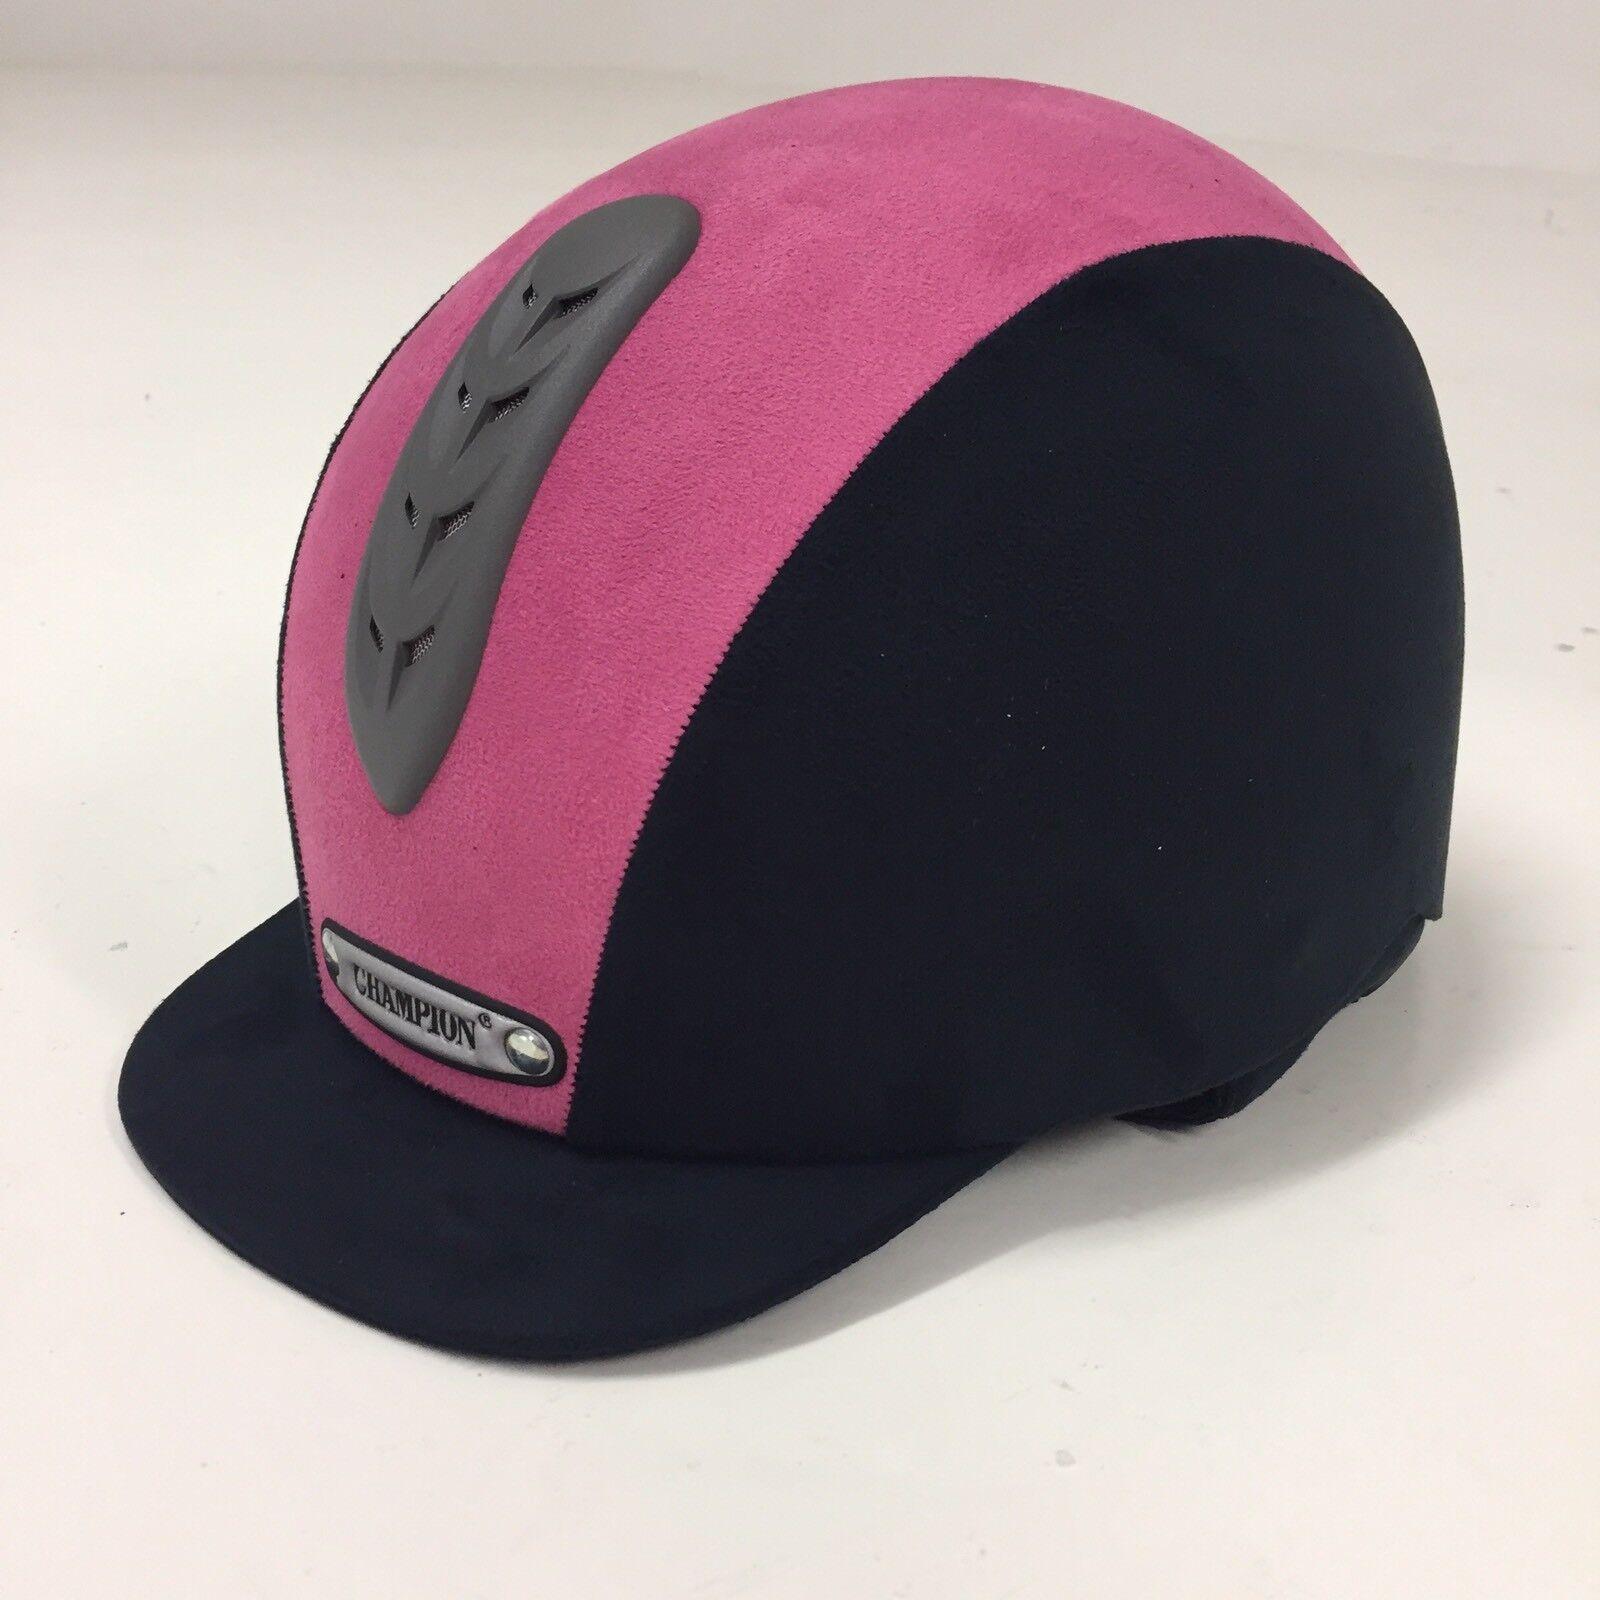 Champion Junior X-Air plus Riding Hat - Pink  Navy 53cm (6 1 2)